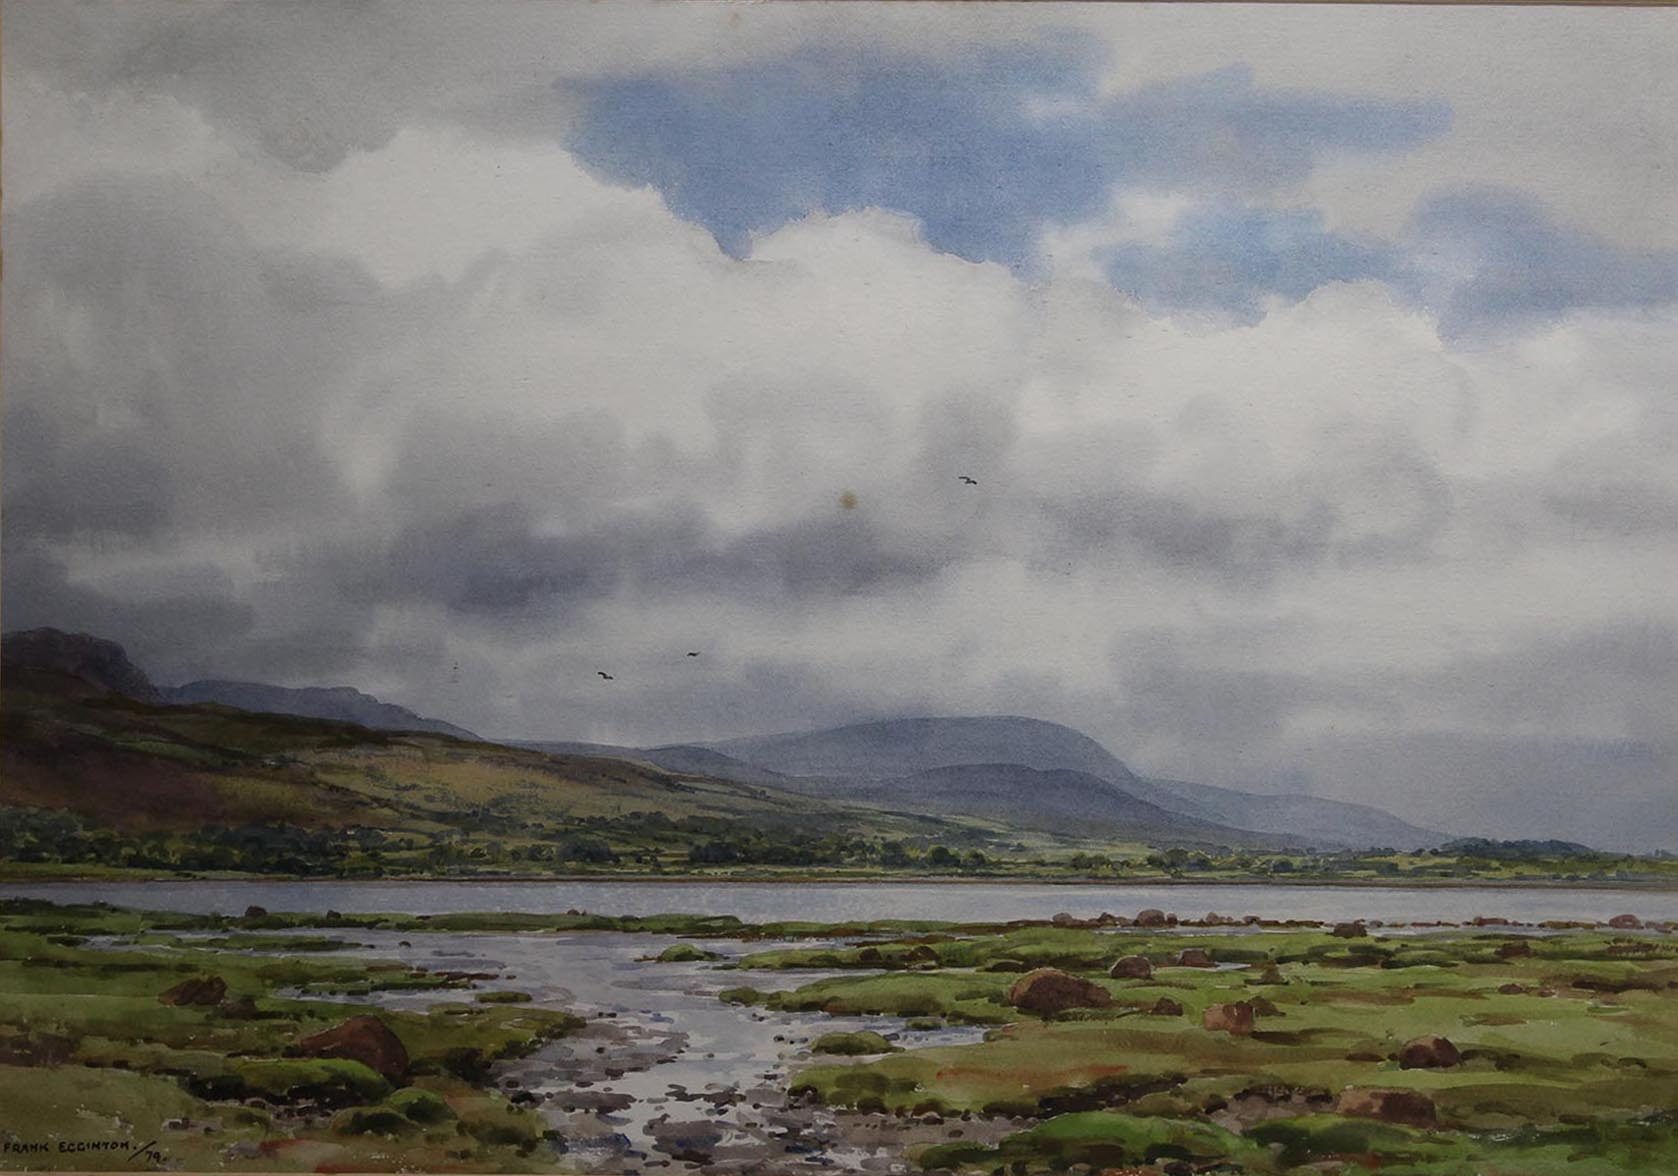 "Lot 46 - Frank Egginton STREAMSTOWN, CO SLIGO Watercolour, 15"" x 21"" (38.1 cm x 53.4 cm), signed"